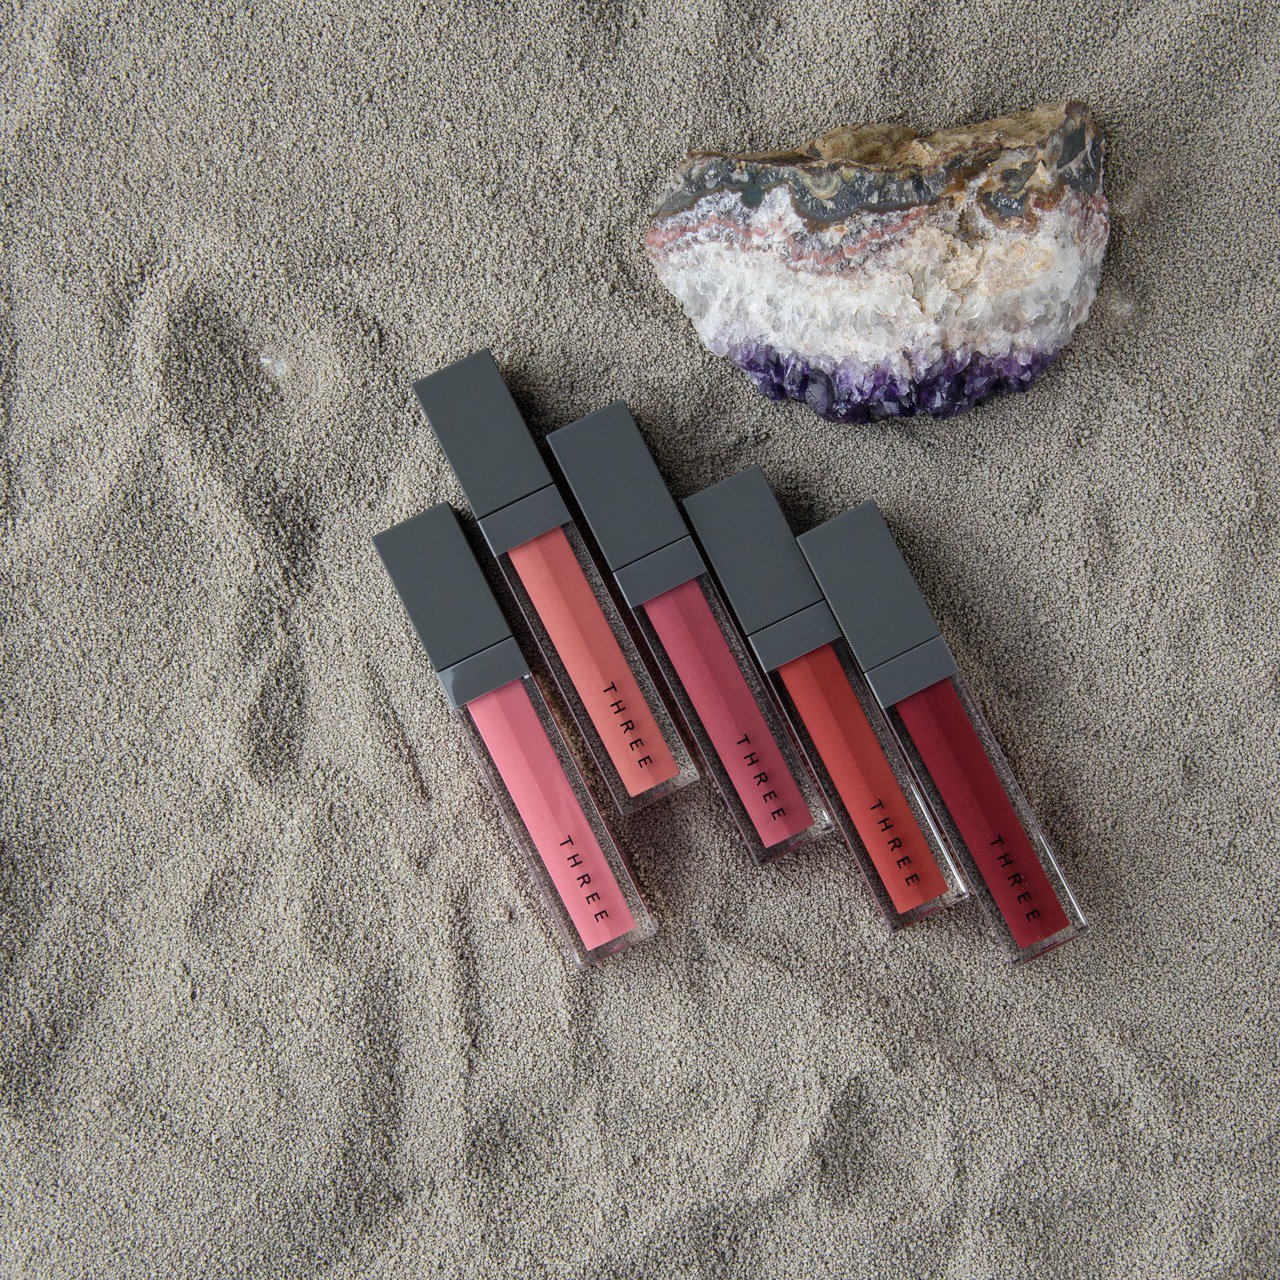 THREE 詩情霧光唇漾、新5色、售價1,250元。圖/THREE提供